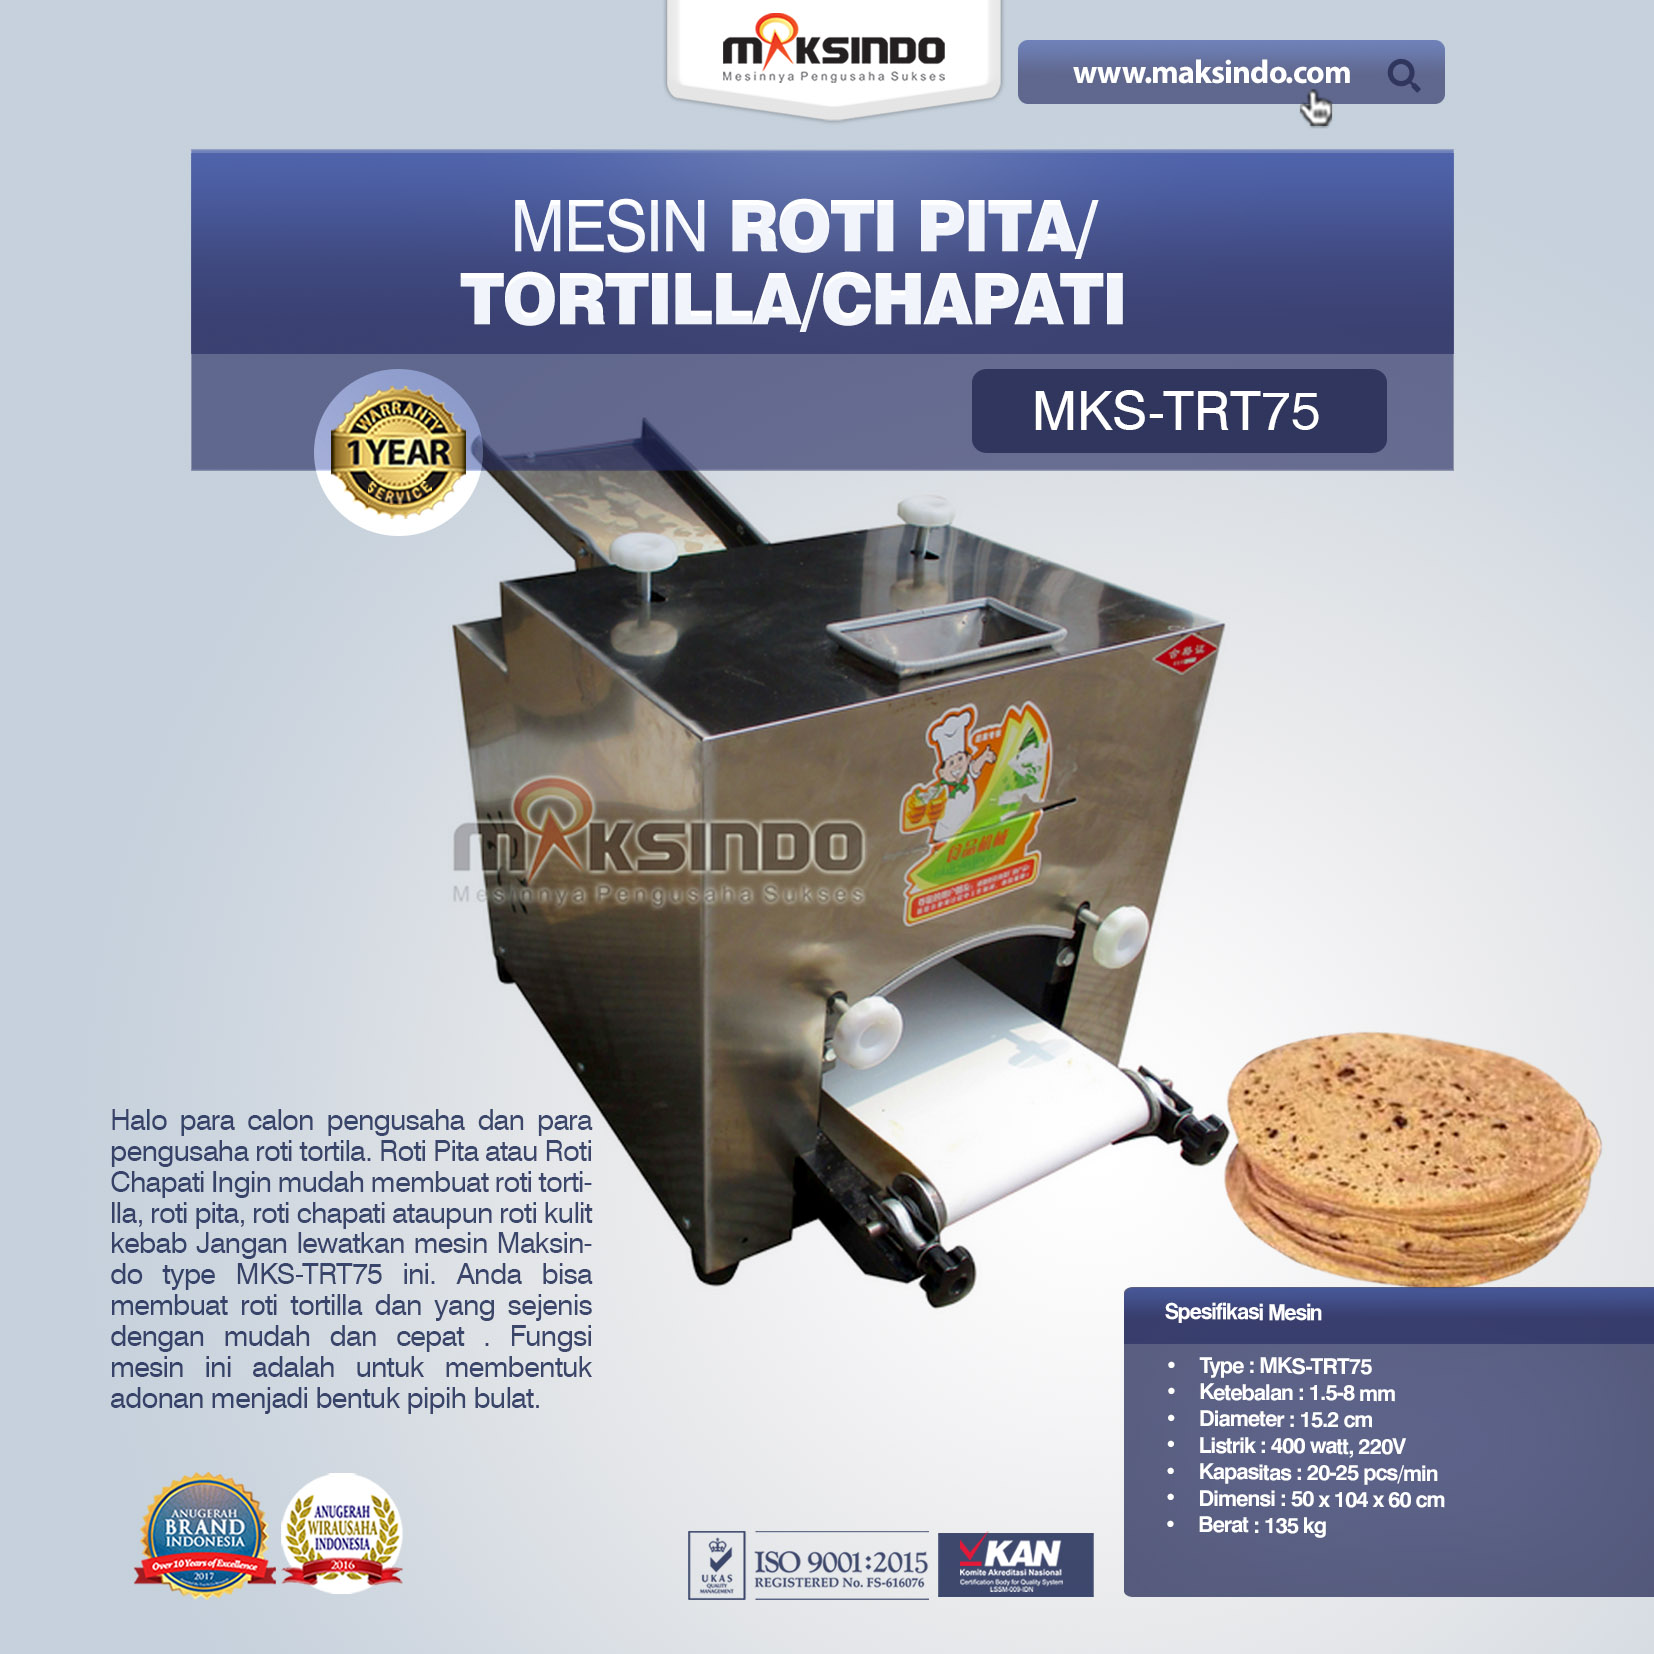 Jaul Mesin Roti Pita/Tortilla/Chapati MKS-TRT75 Di Bekasi